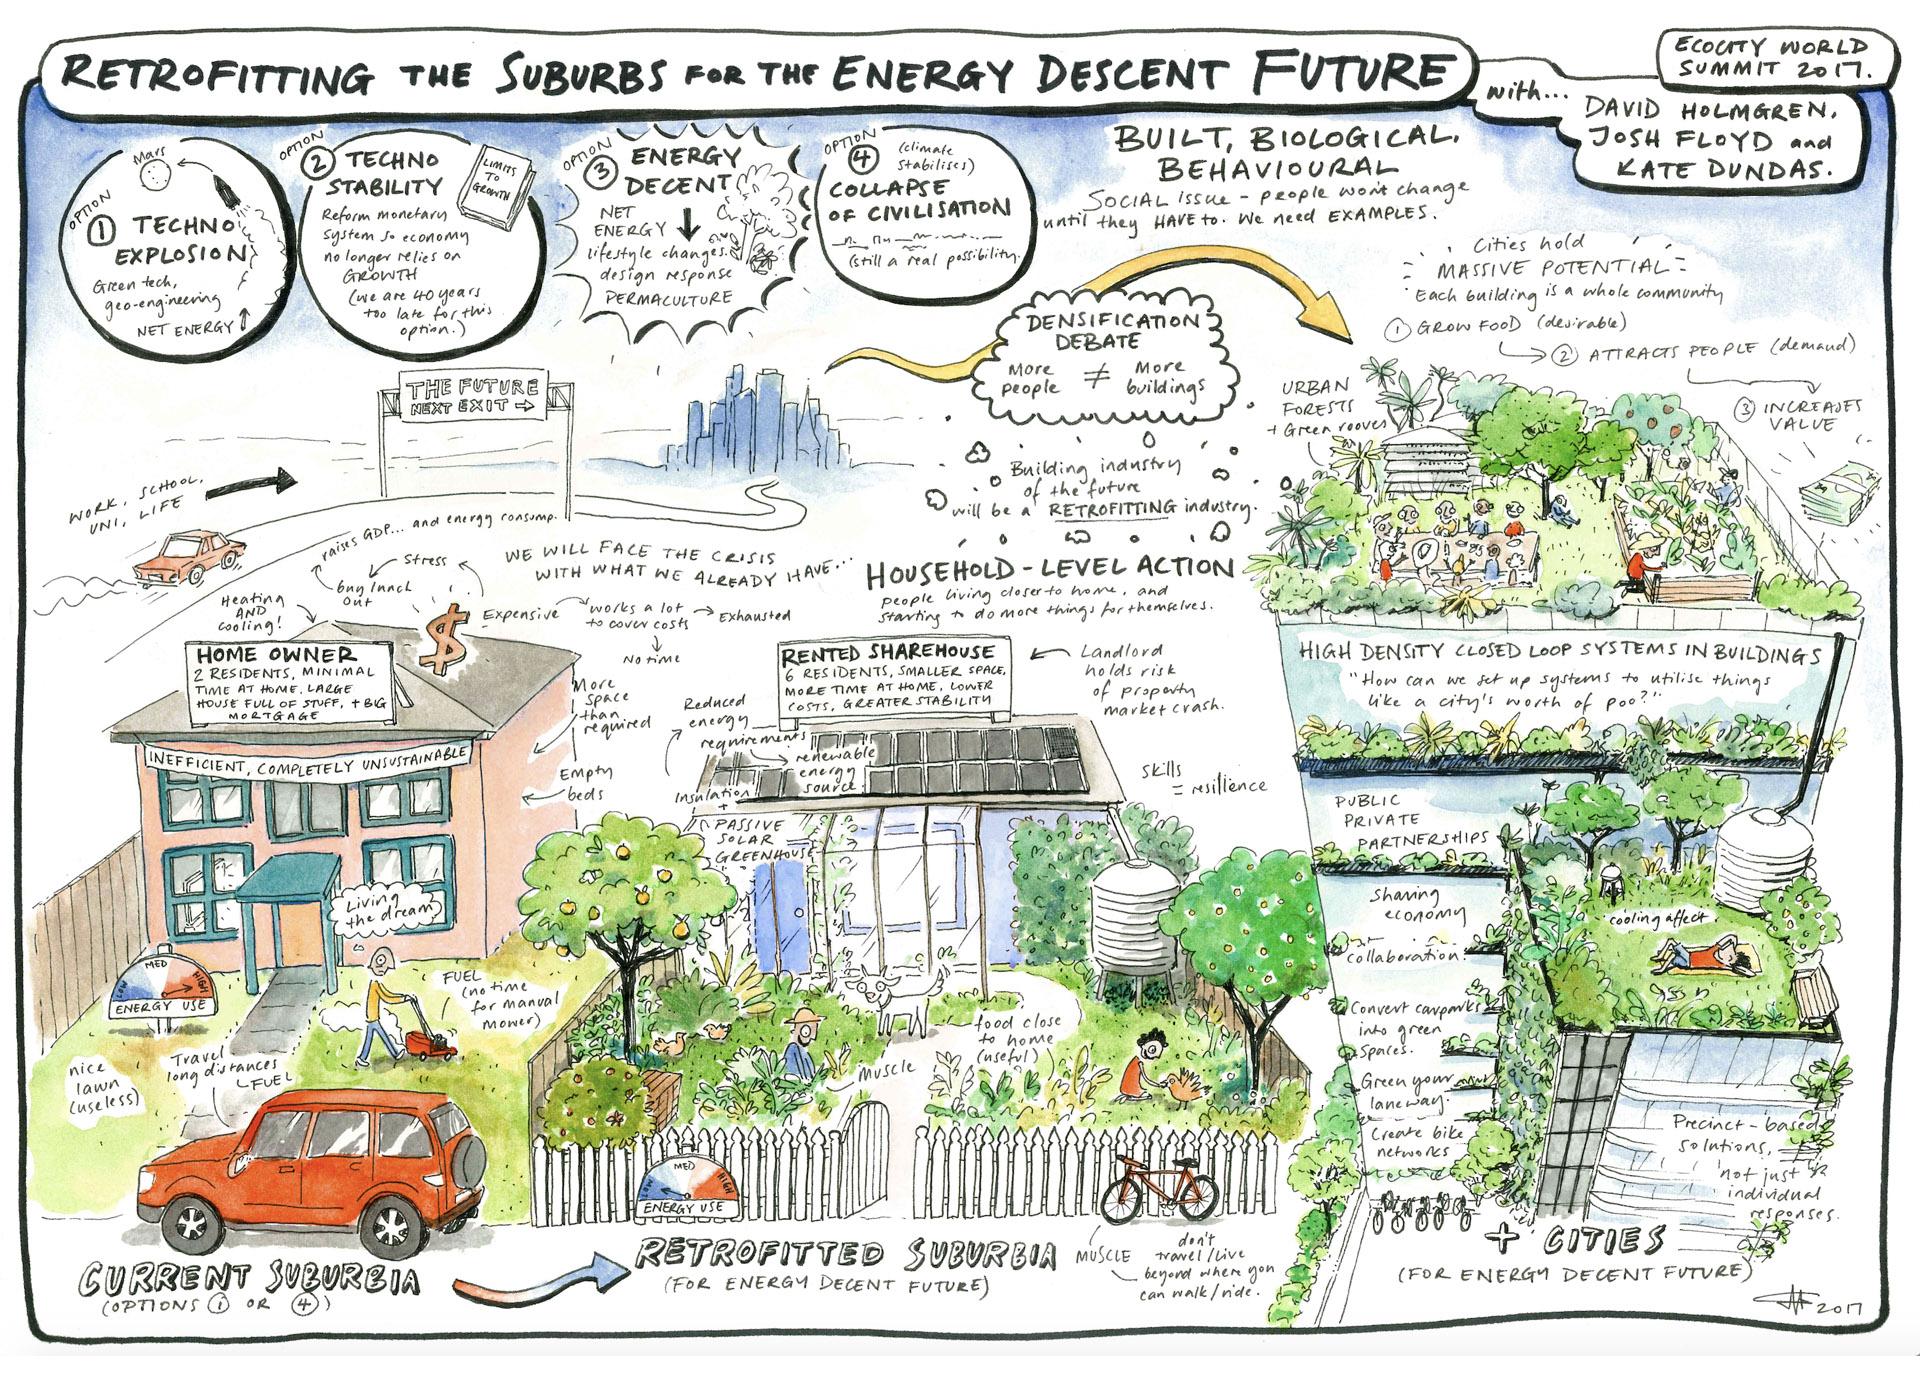 Retrofitting The Suburbs